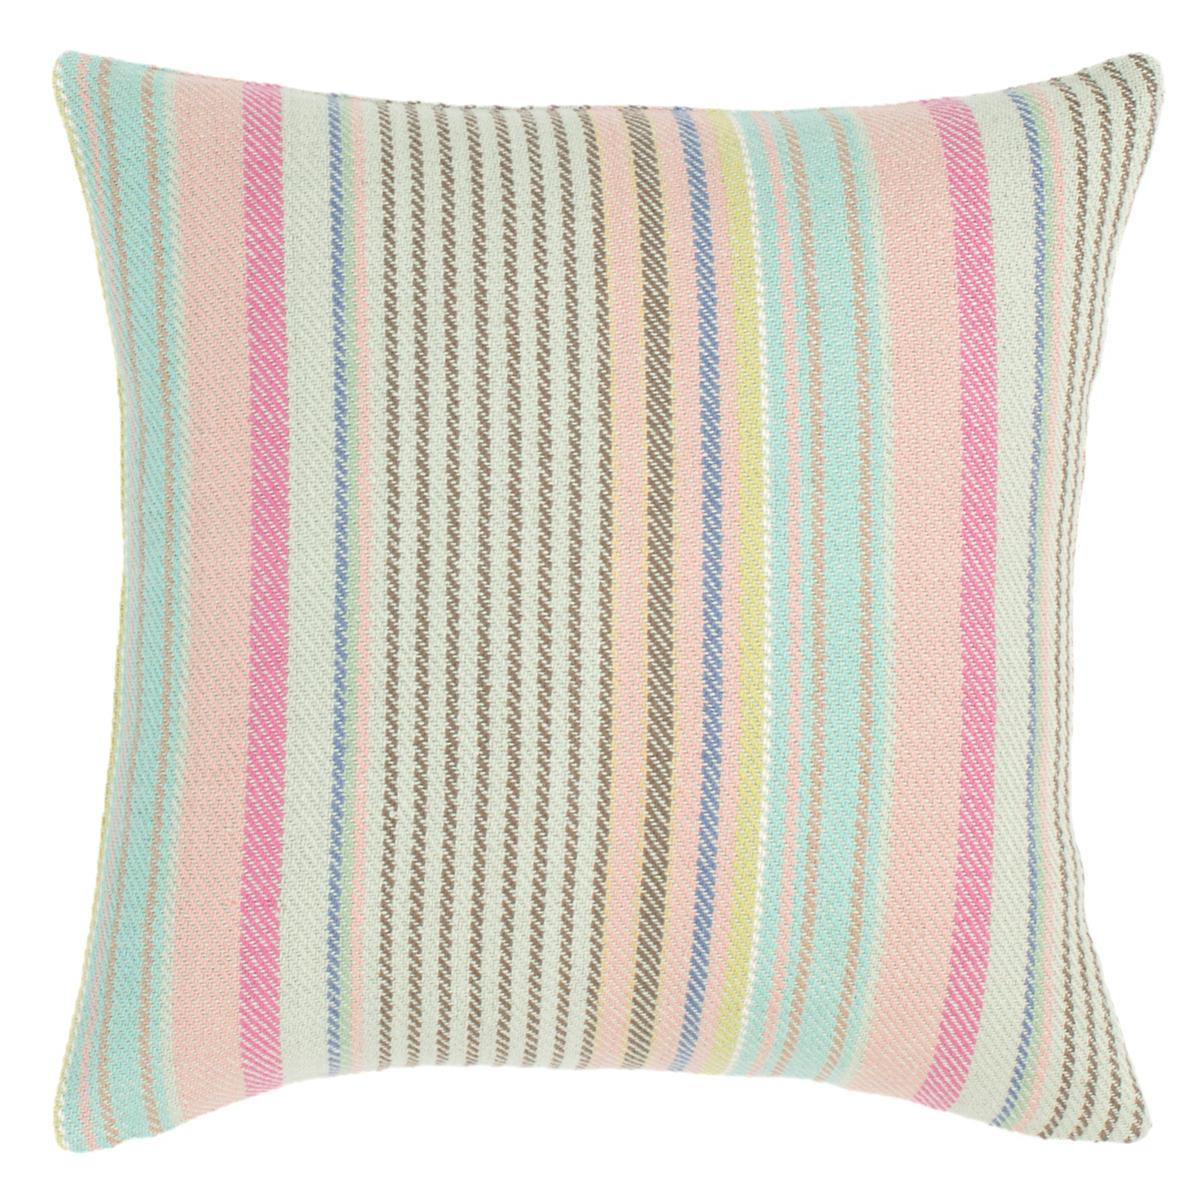 Neapolitan Woven Cotton Decorative Pillow